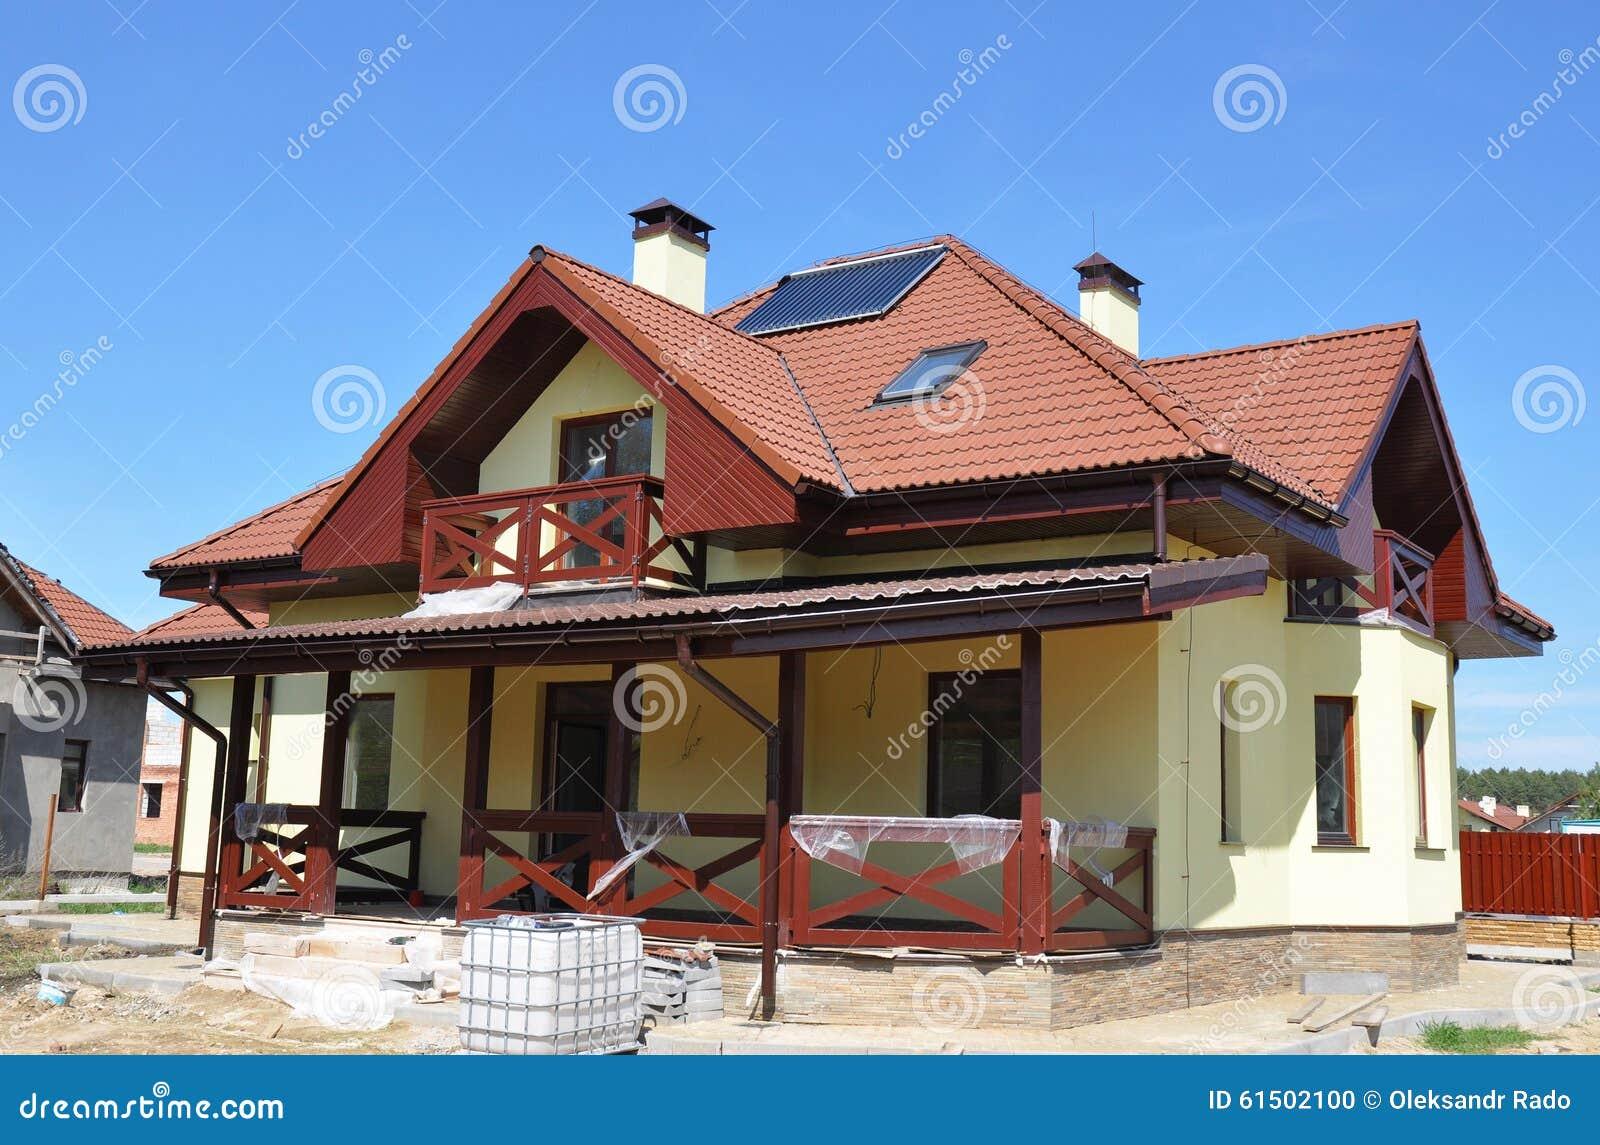 Energy Efficiency Passive House Building Concept Outdoor. Closeup on Solar Water Heater, Dormers, Gutter, Solar Panels, Skylights